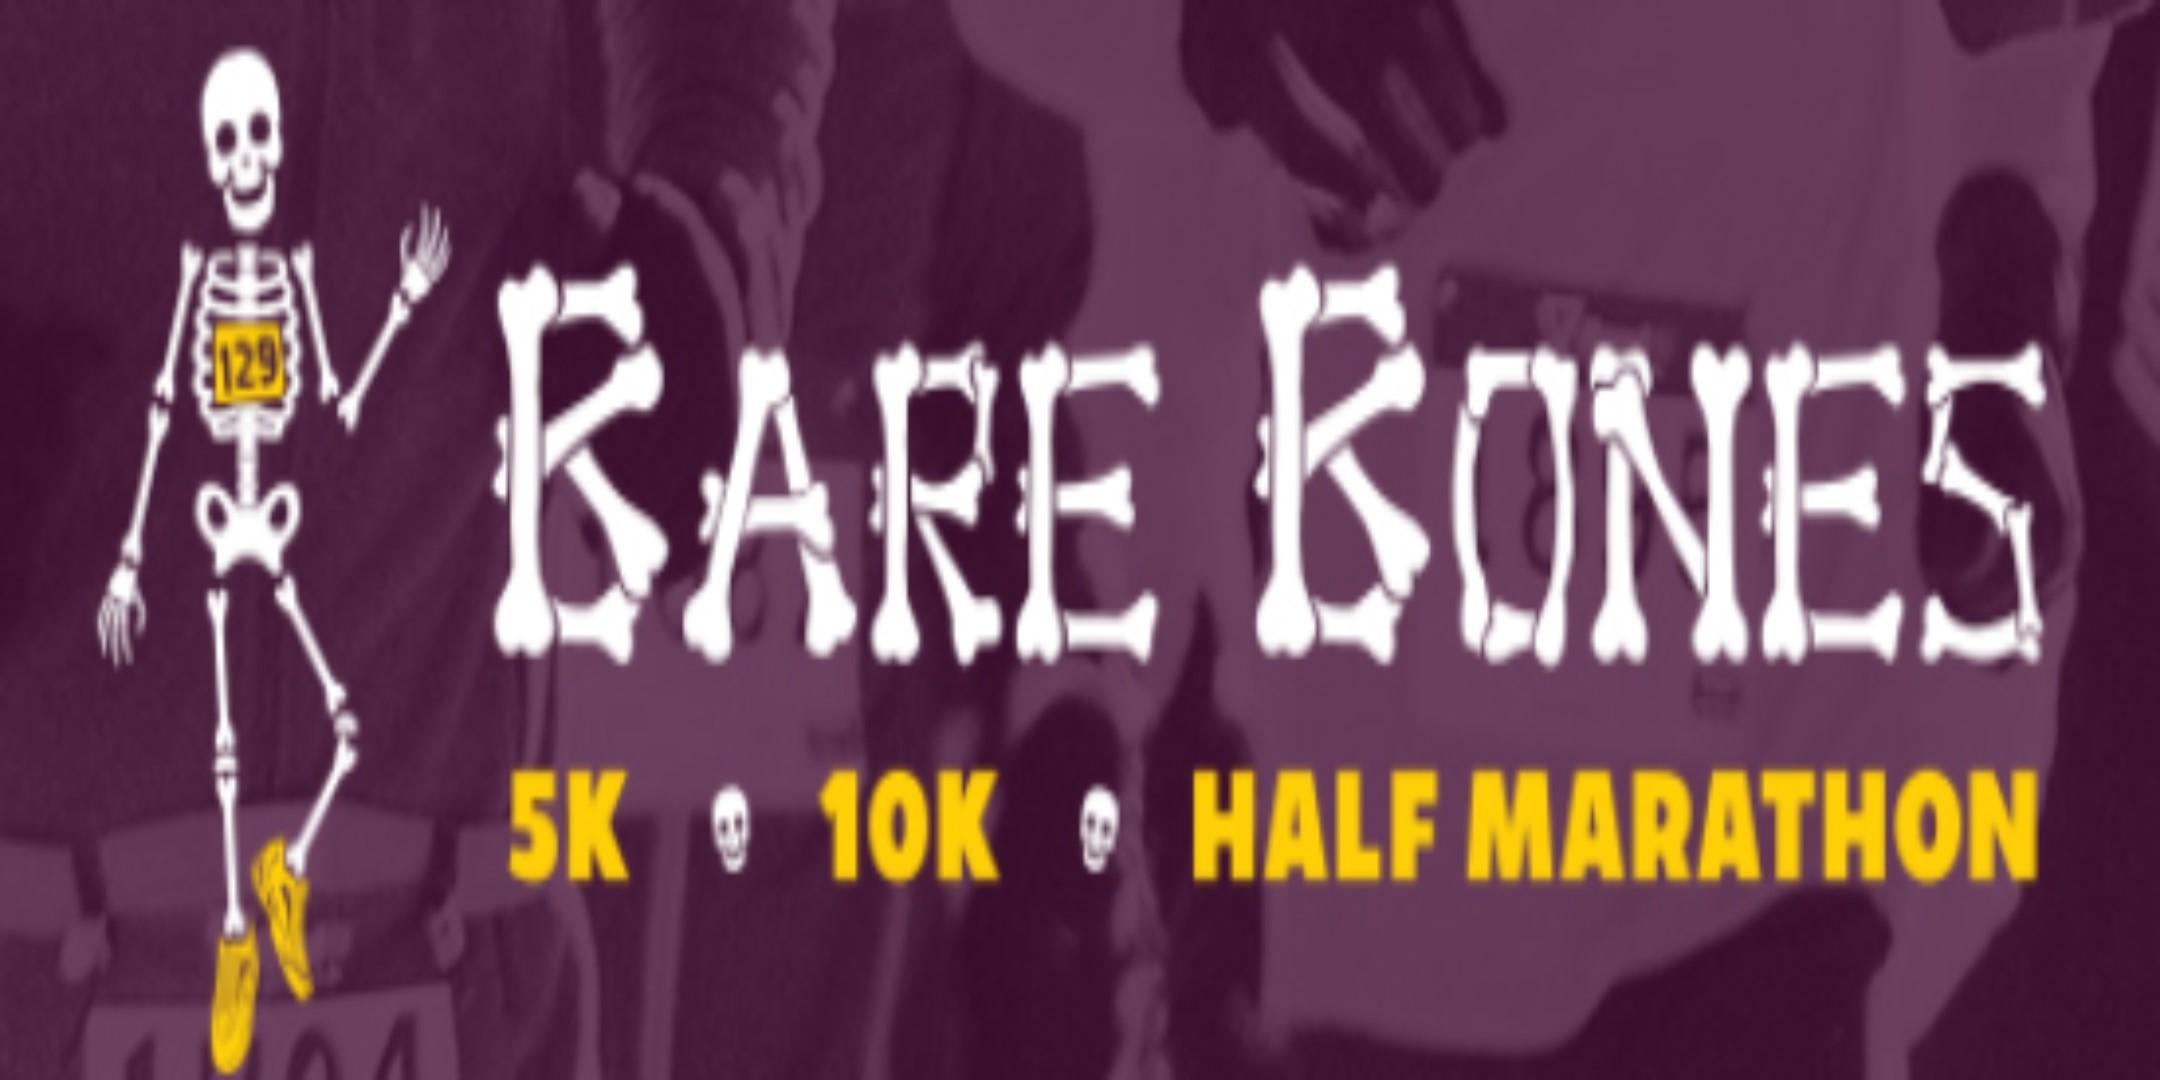 Bare Bones Half Marathon/5K/10K/10M